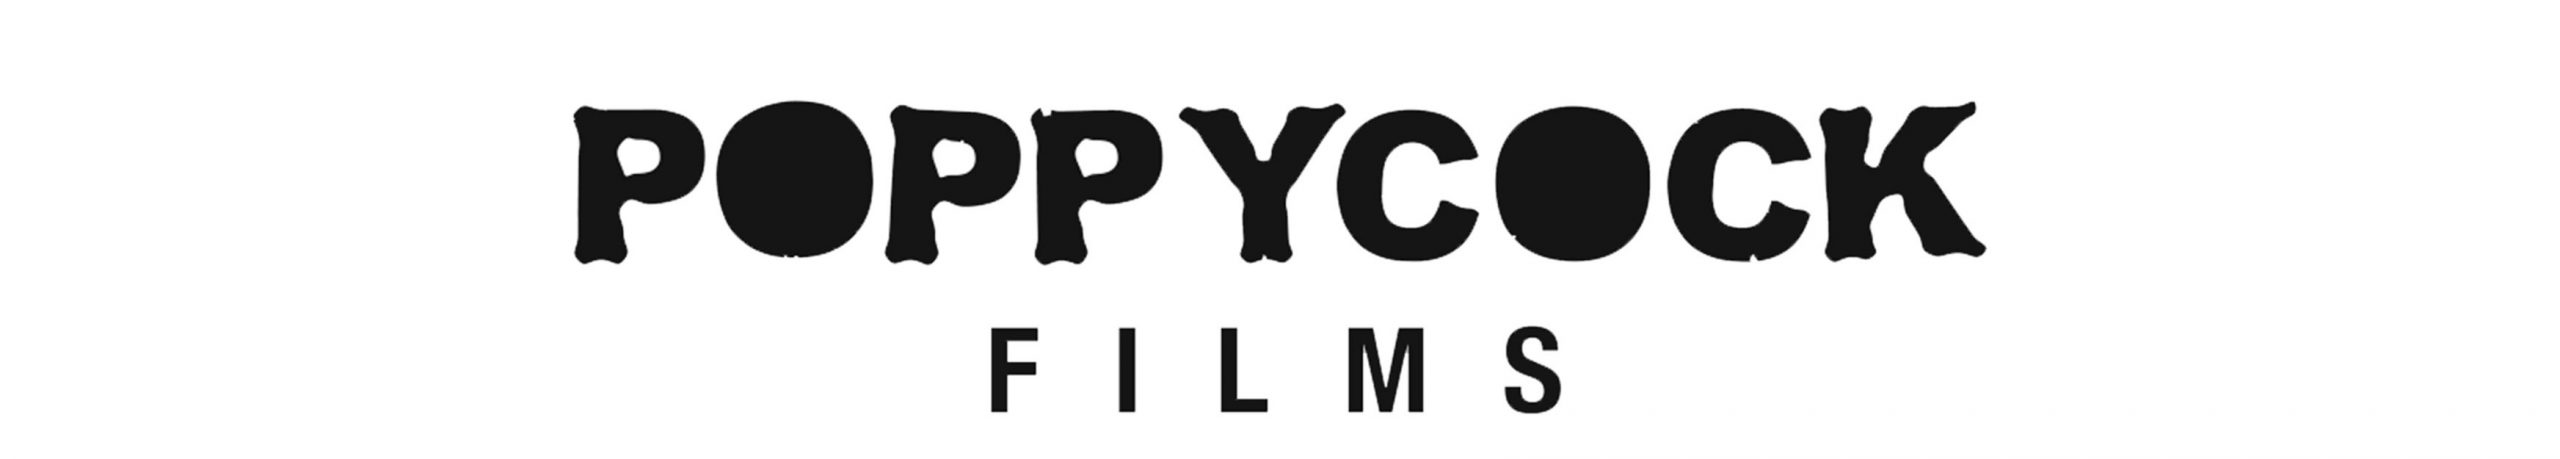 Poppycock Films Logo